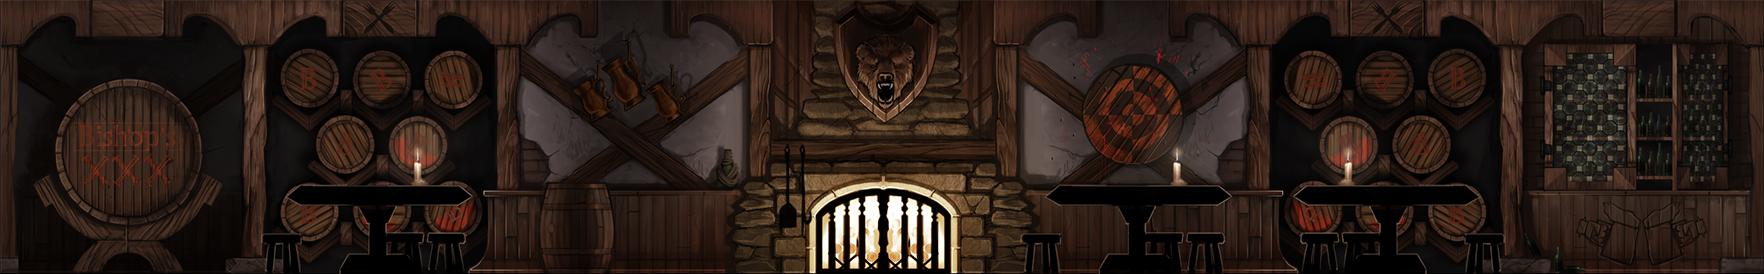 TavernWall2s